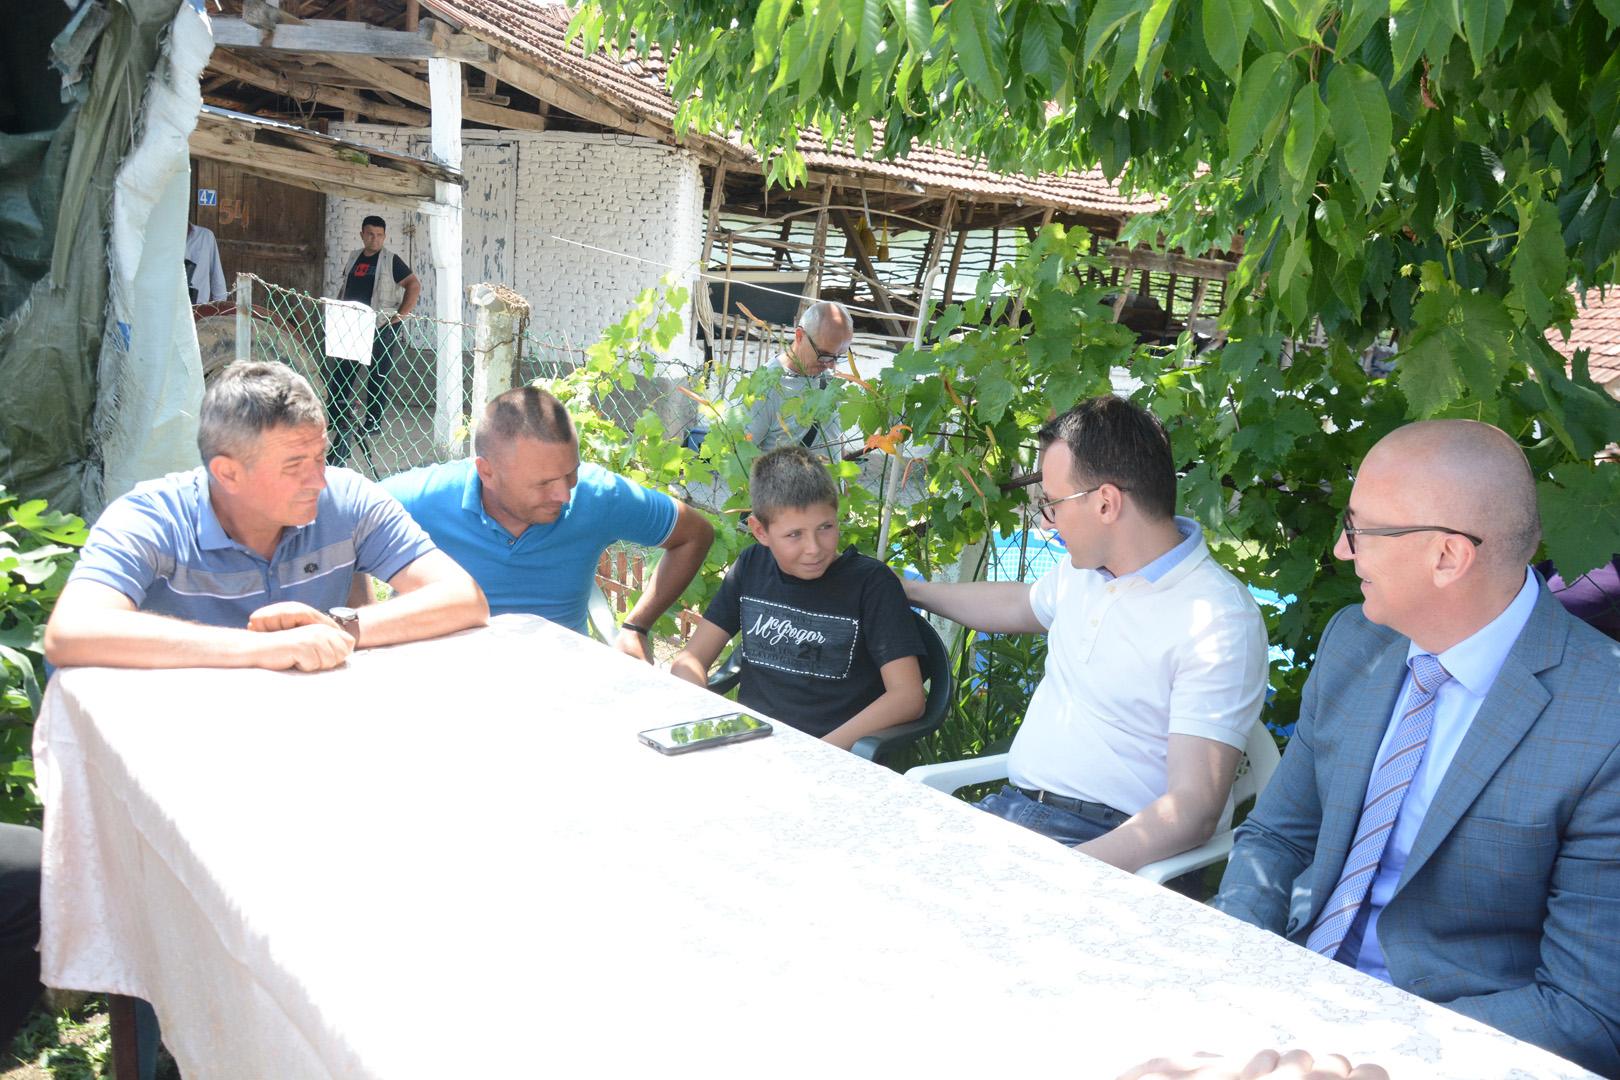 gojbulja-petkovic-i-rakic-posetili-nikolu-perica